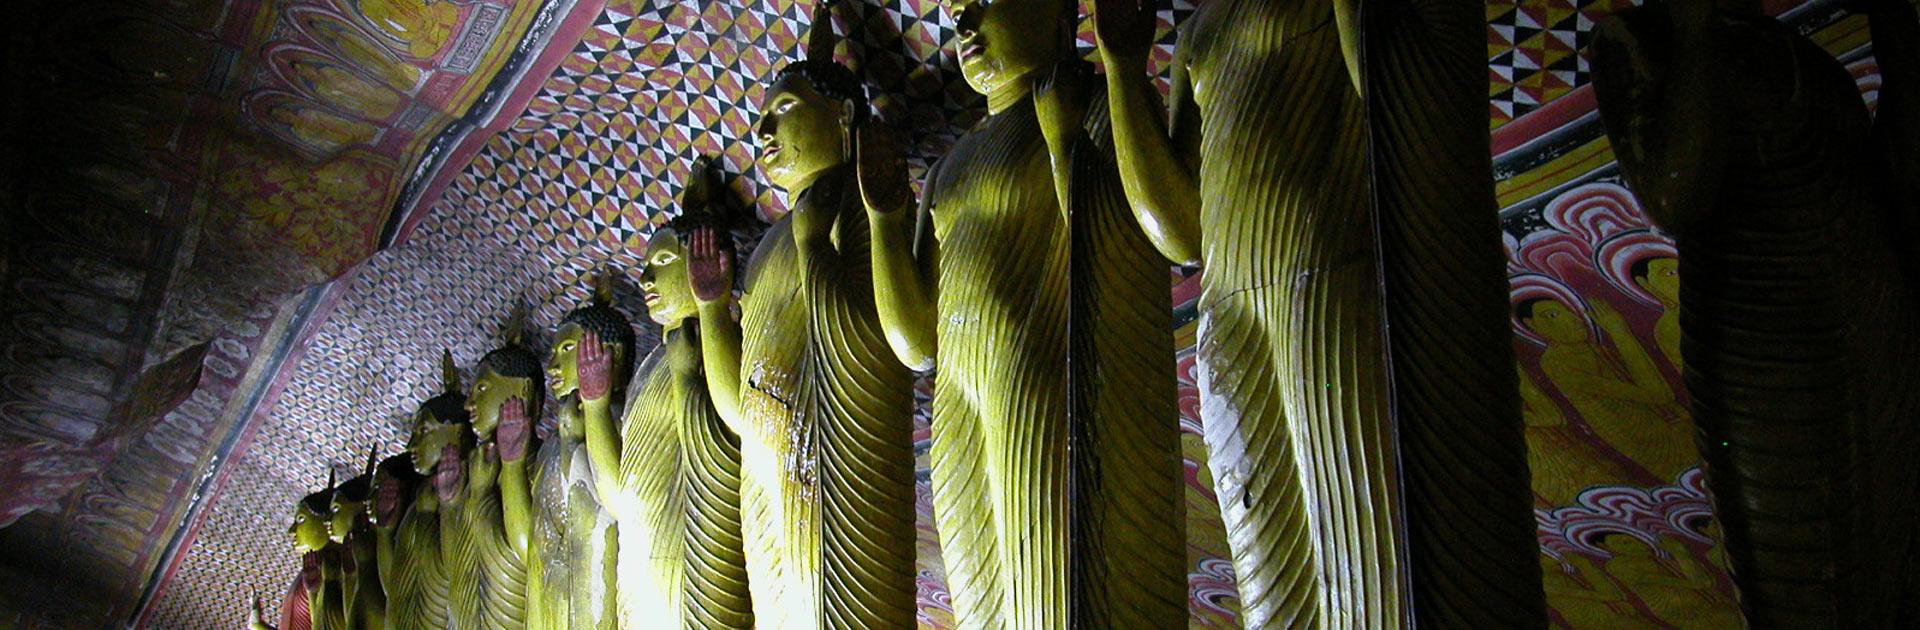 LK La Maravilla del Índico con Pasikudah 12 días 3